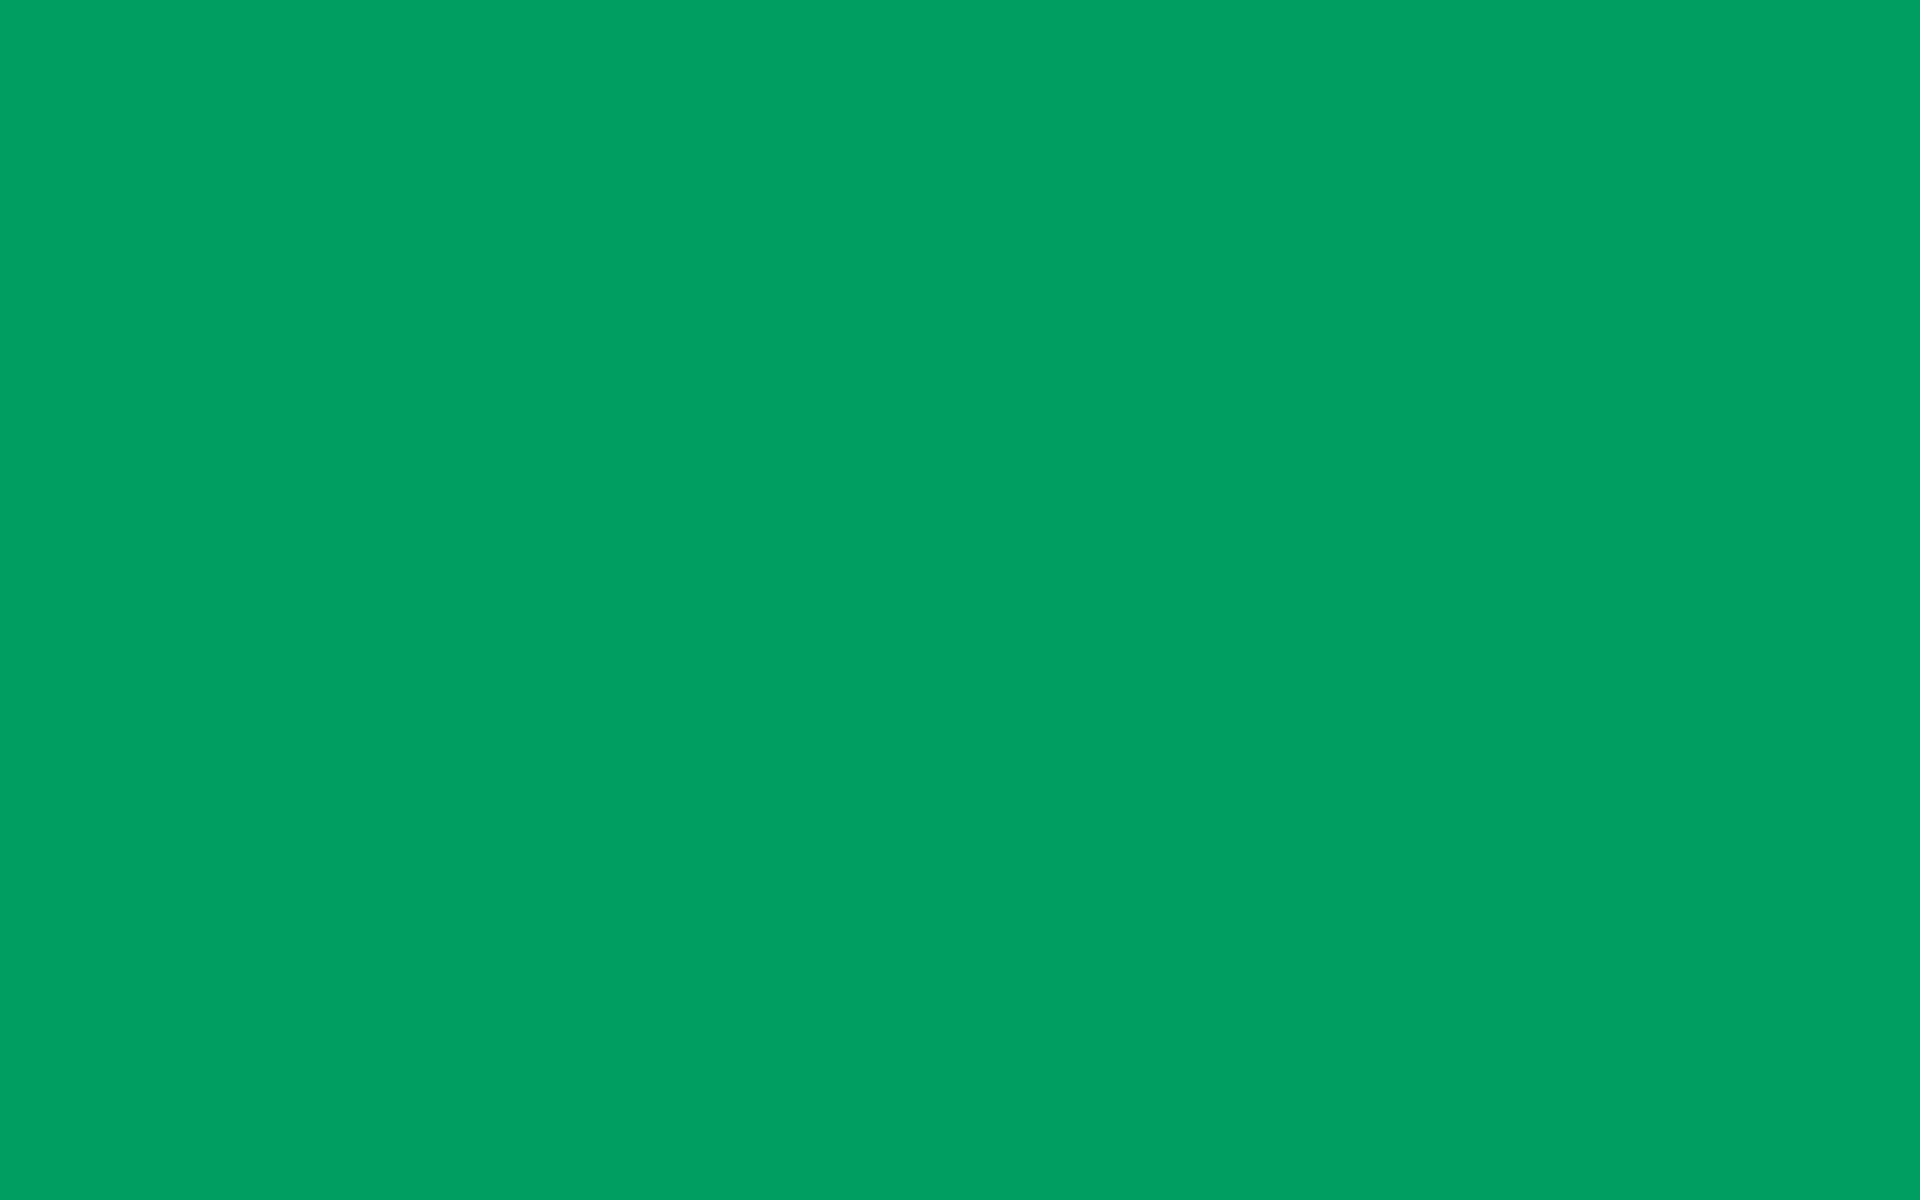 1920x1200 Shamrock Green Solid Color Background